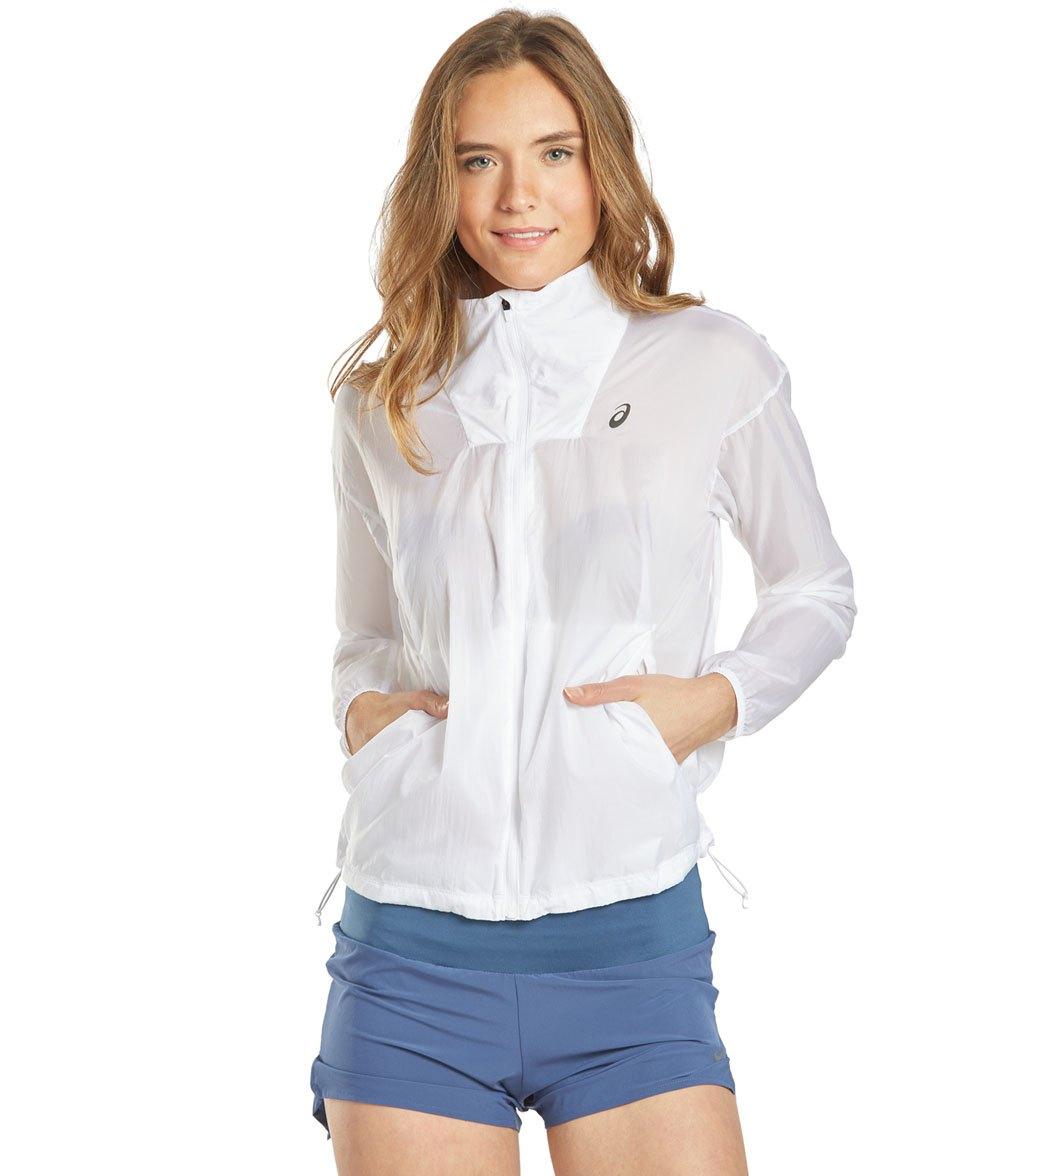 Asics Women's Tokyo Jacket